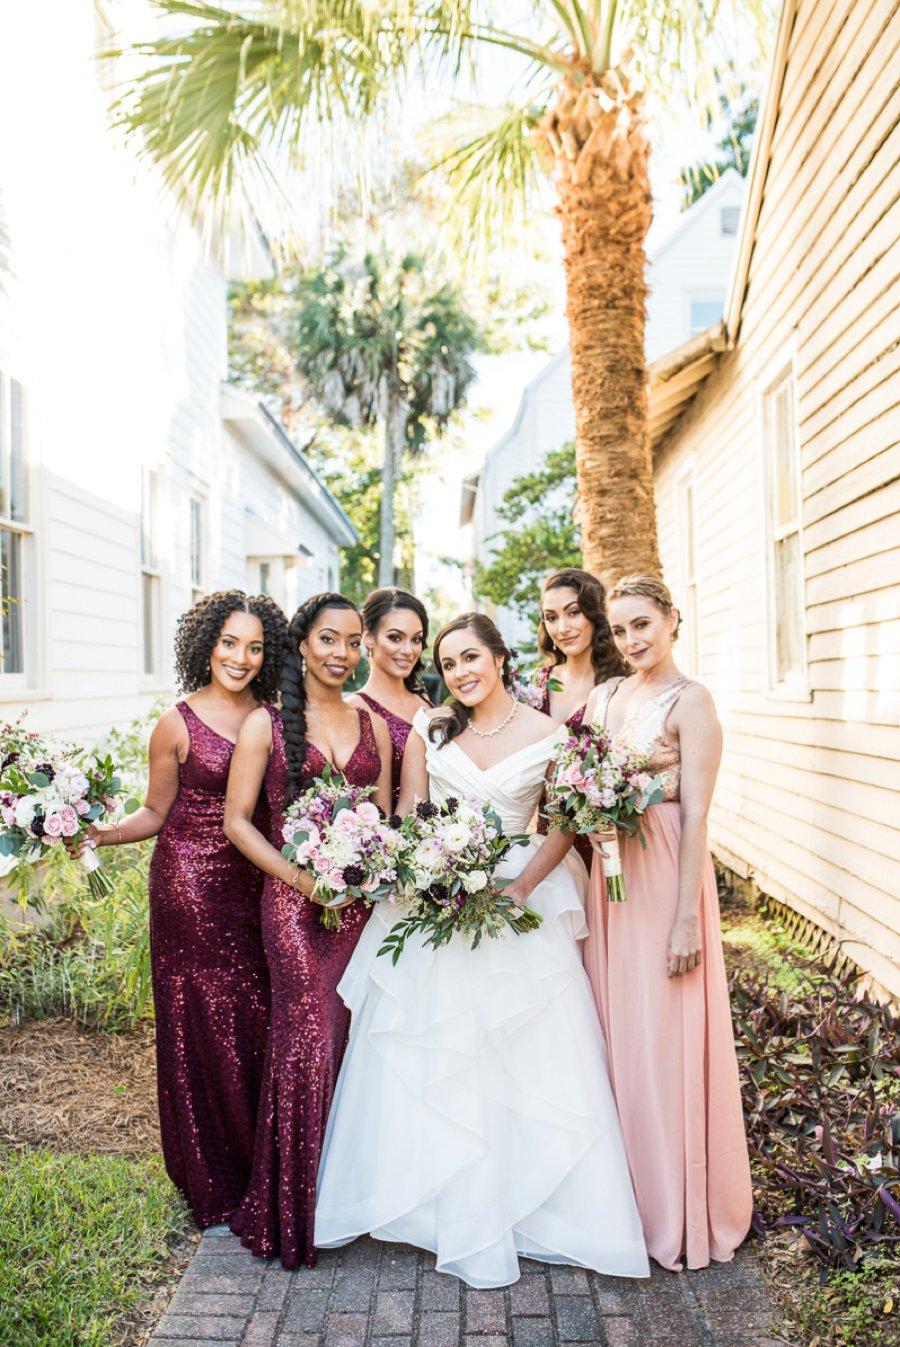 An Elegant Burgundy & Gold Tented Pensacola Wedding Day via TheELD.com